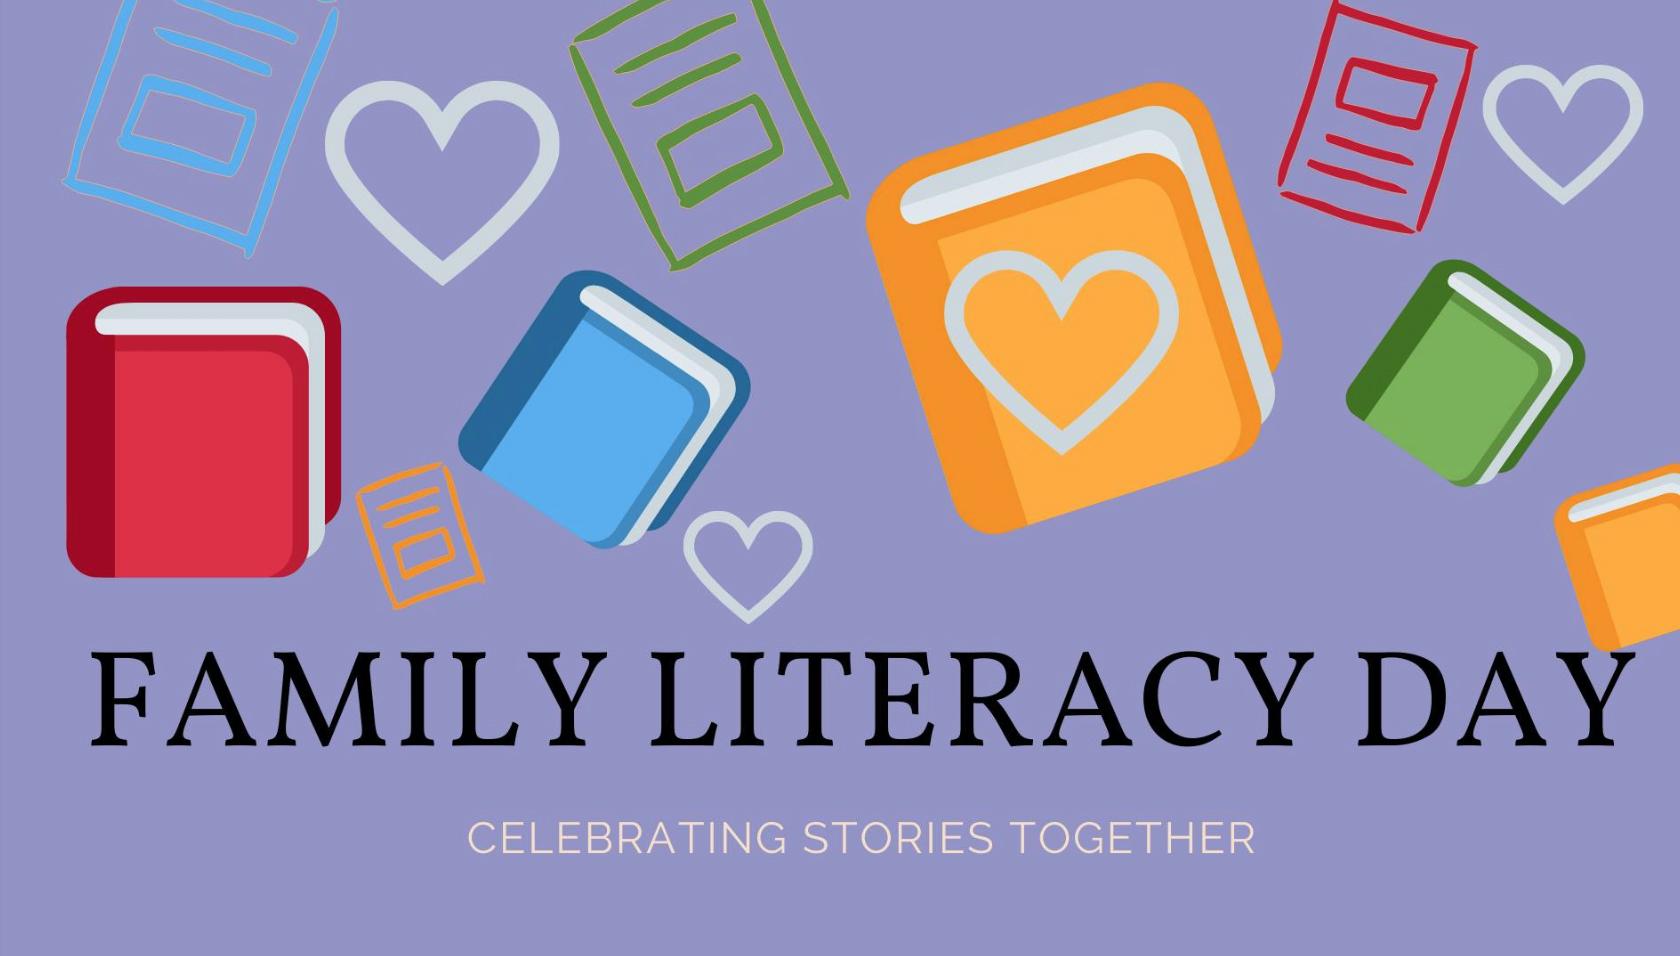 Family Literacy Day 2020